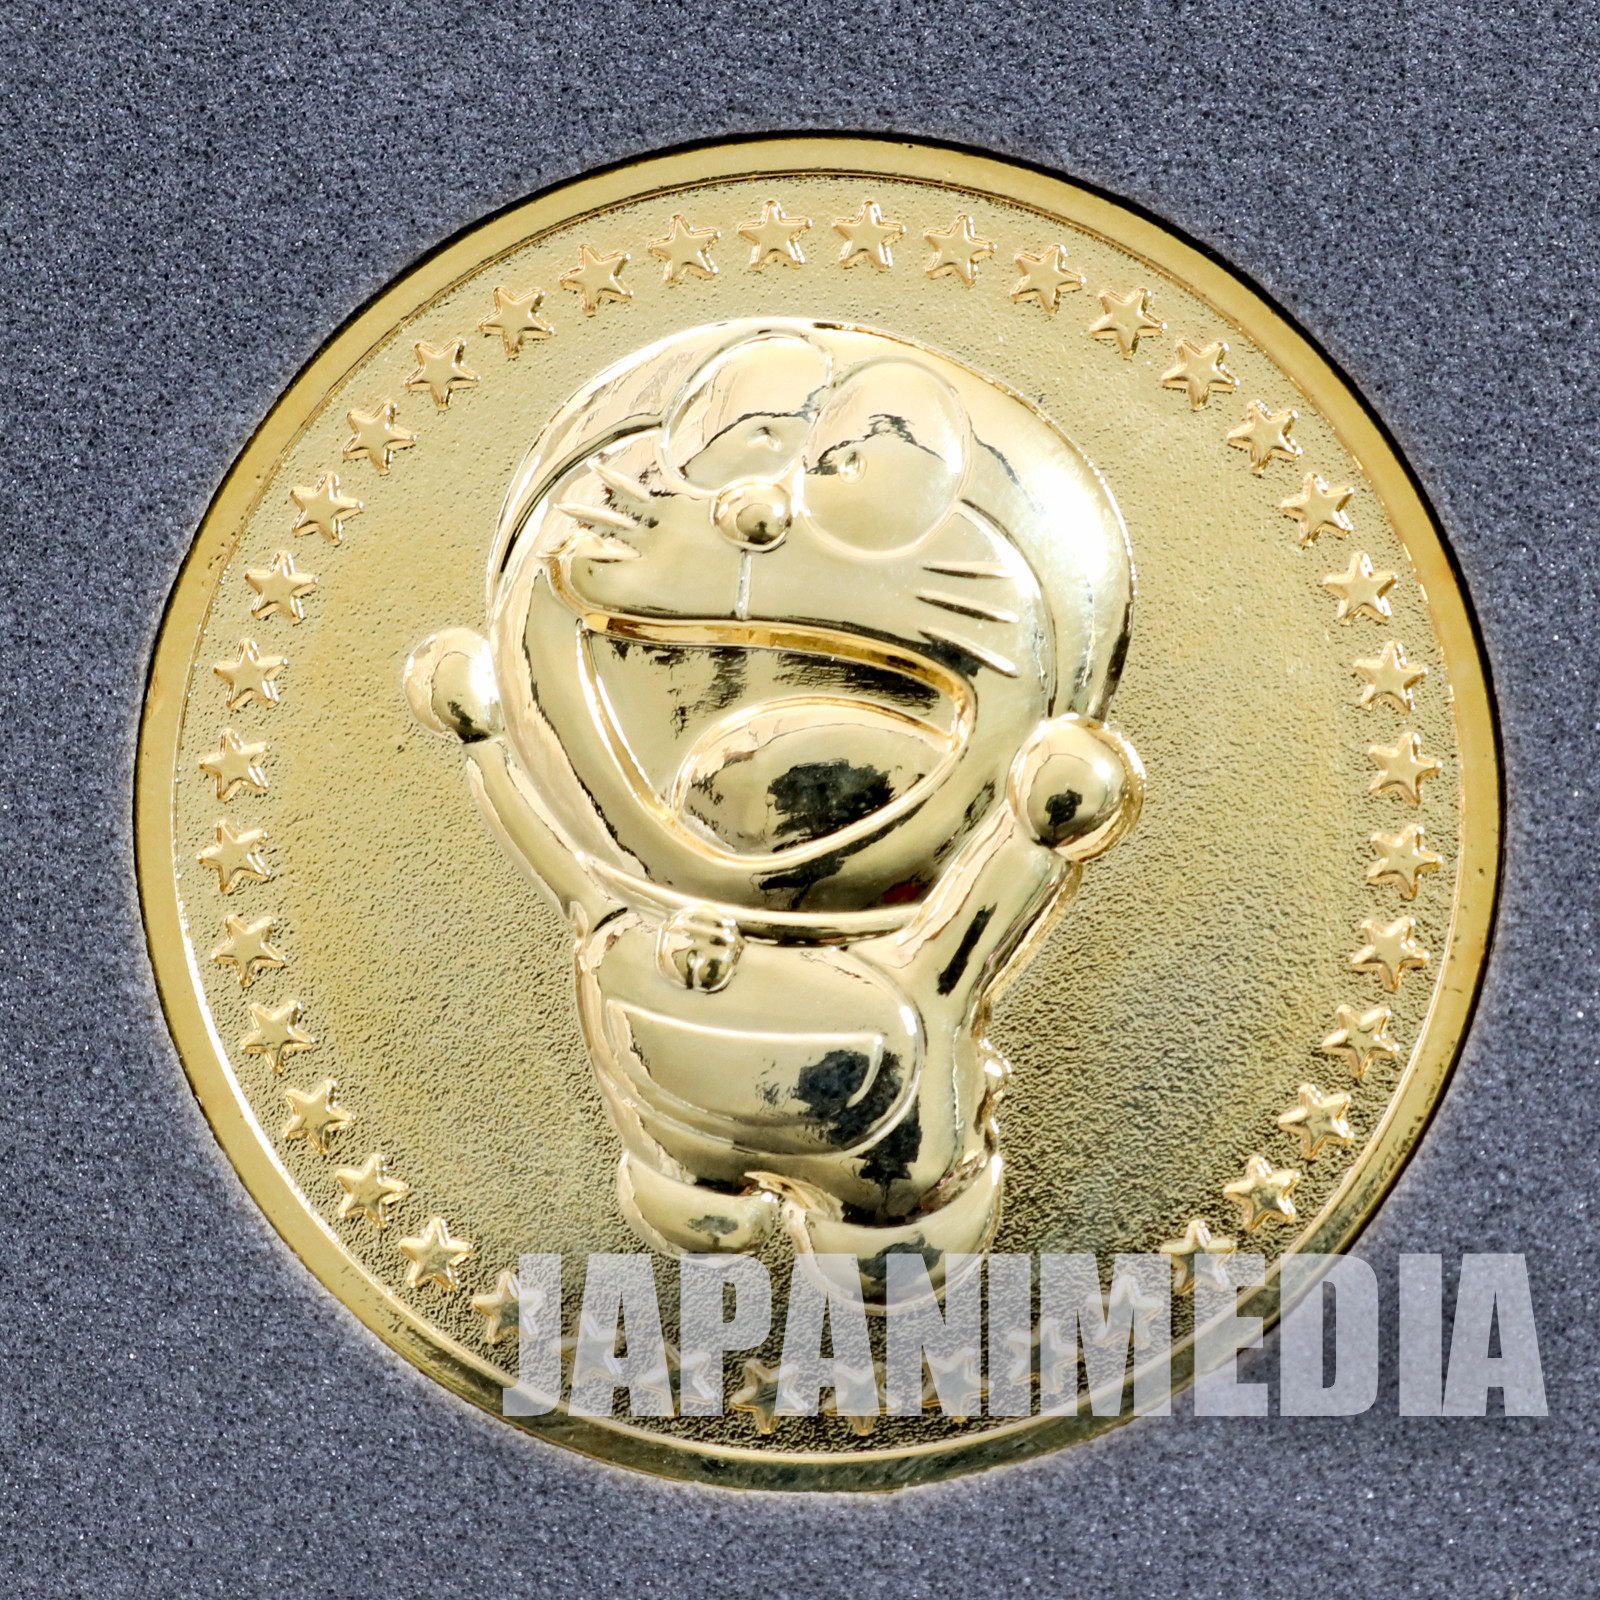 Doraemon: Nobita to Mugen Sankenshi Movie 1994 Memorial Medal JAPAN